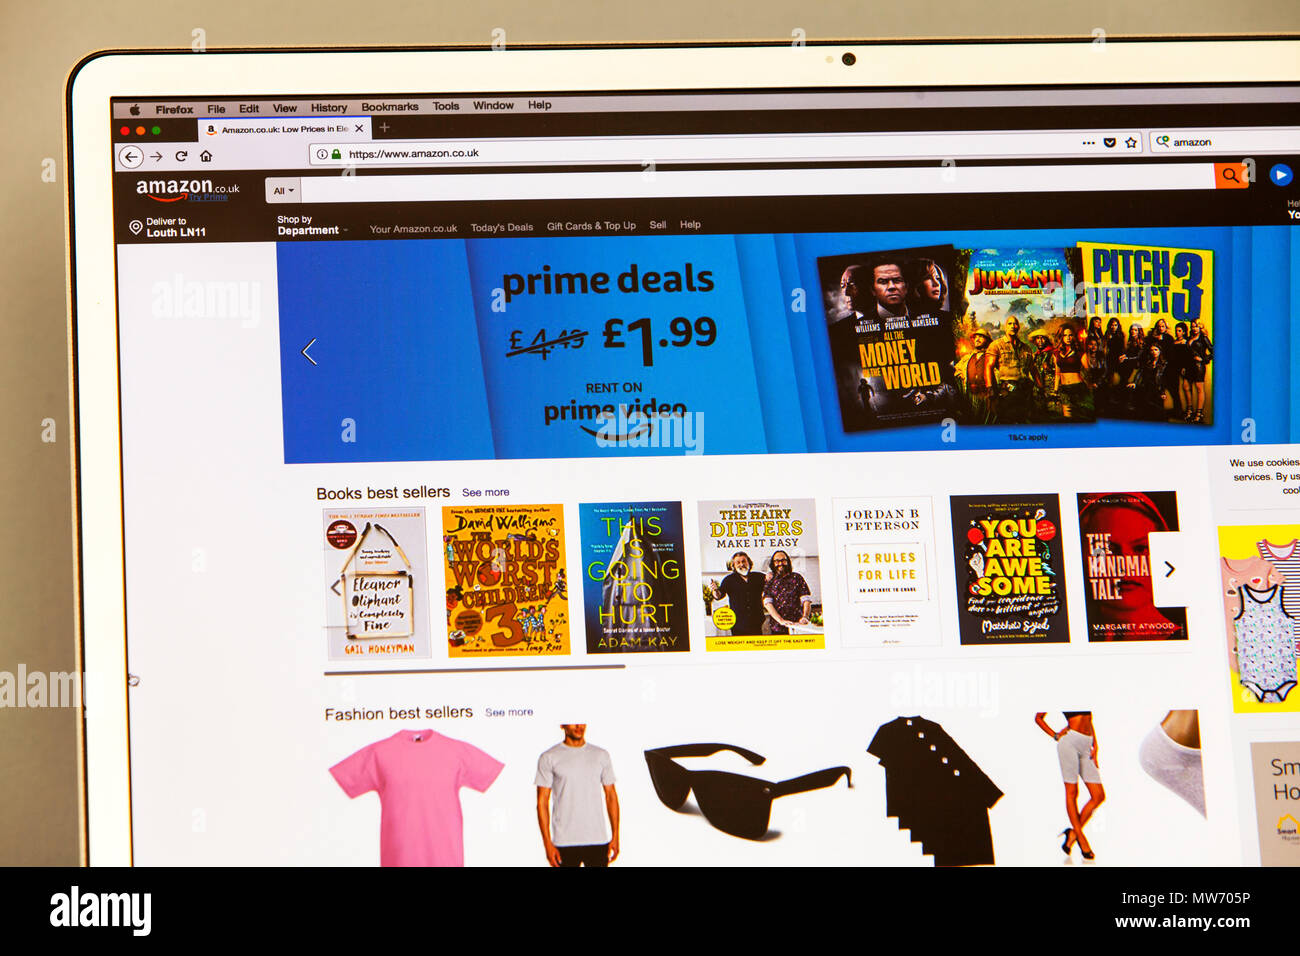 Amazon, Amazon website, Amazon homepage, Amazon shop, Amazon web page, Web page, website, internet page, homepage, web, page, pages,online shopping - Stock Image